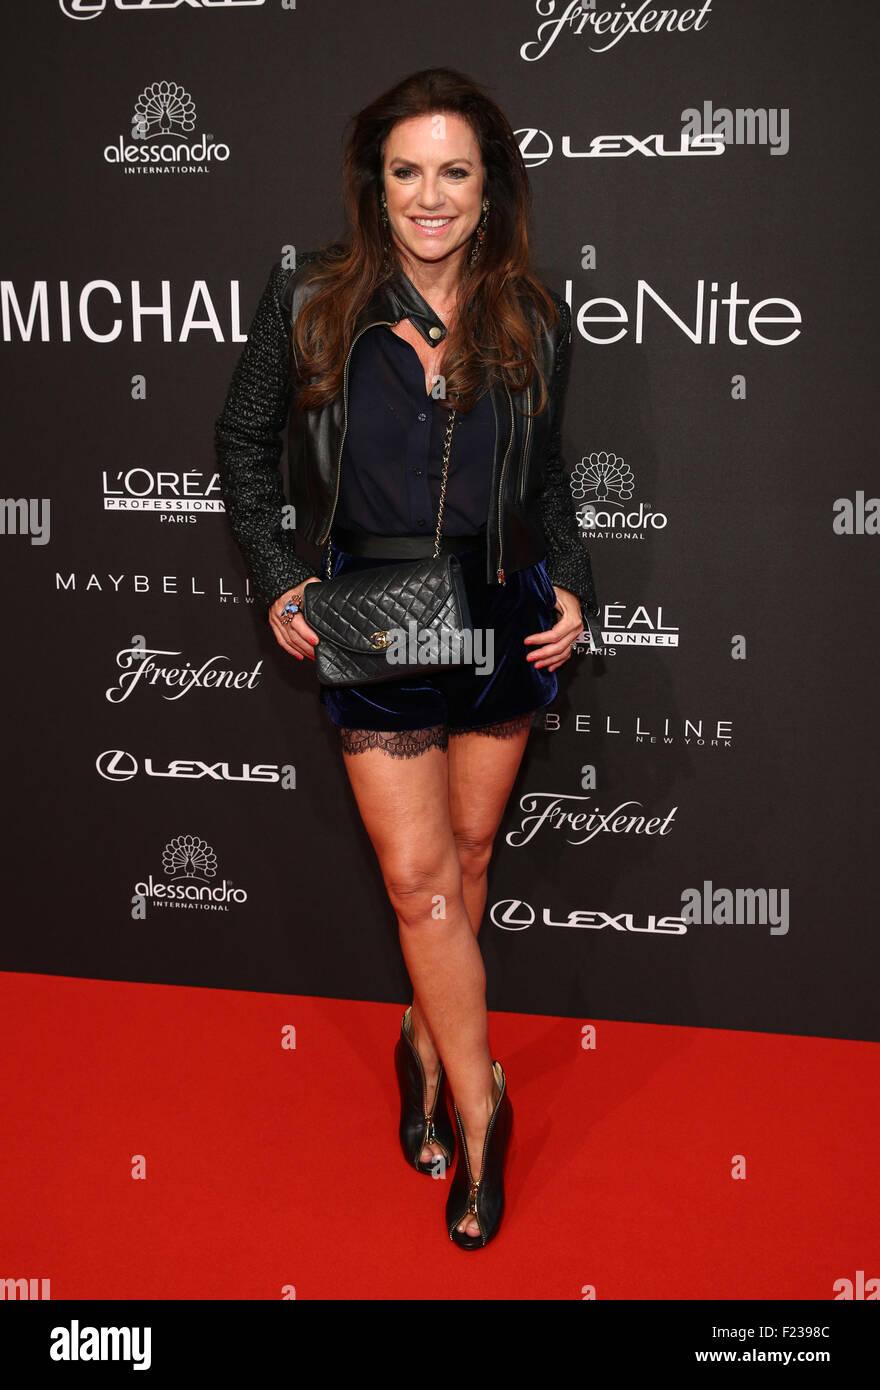 Michalsky stylenite as part of mercedes benz fashion week